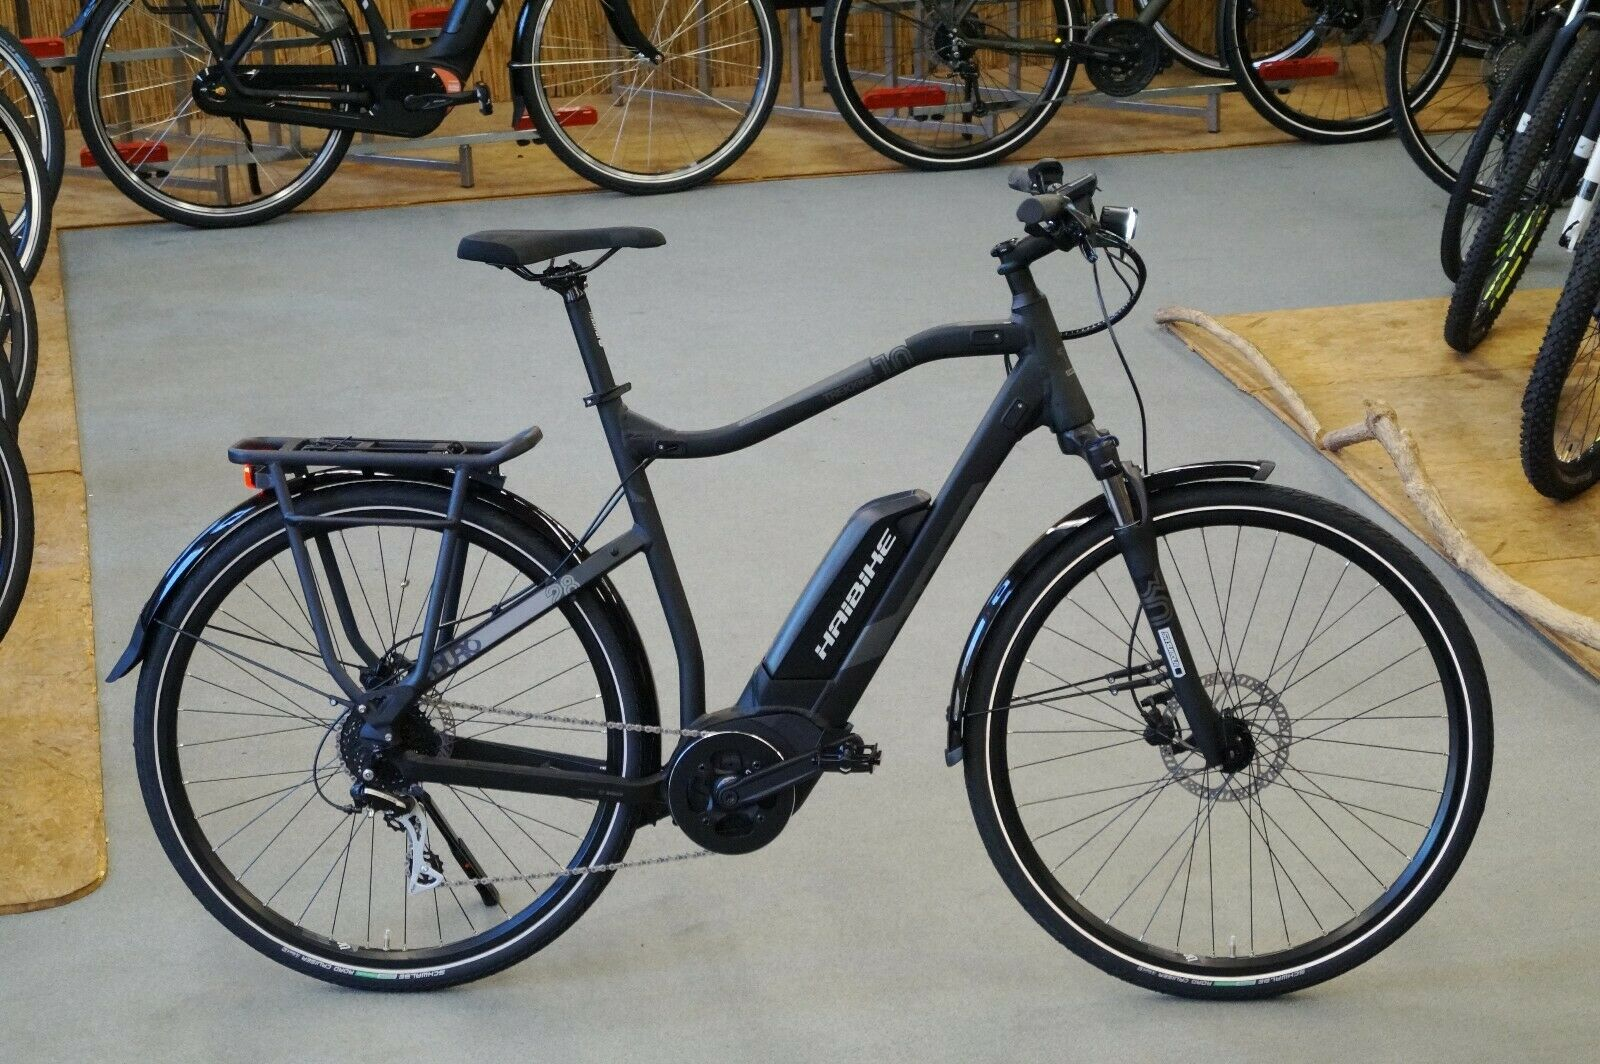 HAIBIKE SDURO TREKKING 1.0 28     RH52cm E-bike 400Wh BOSCH Mod. 2019 a57112